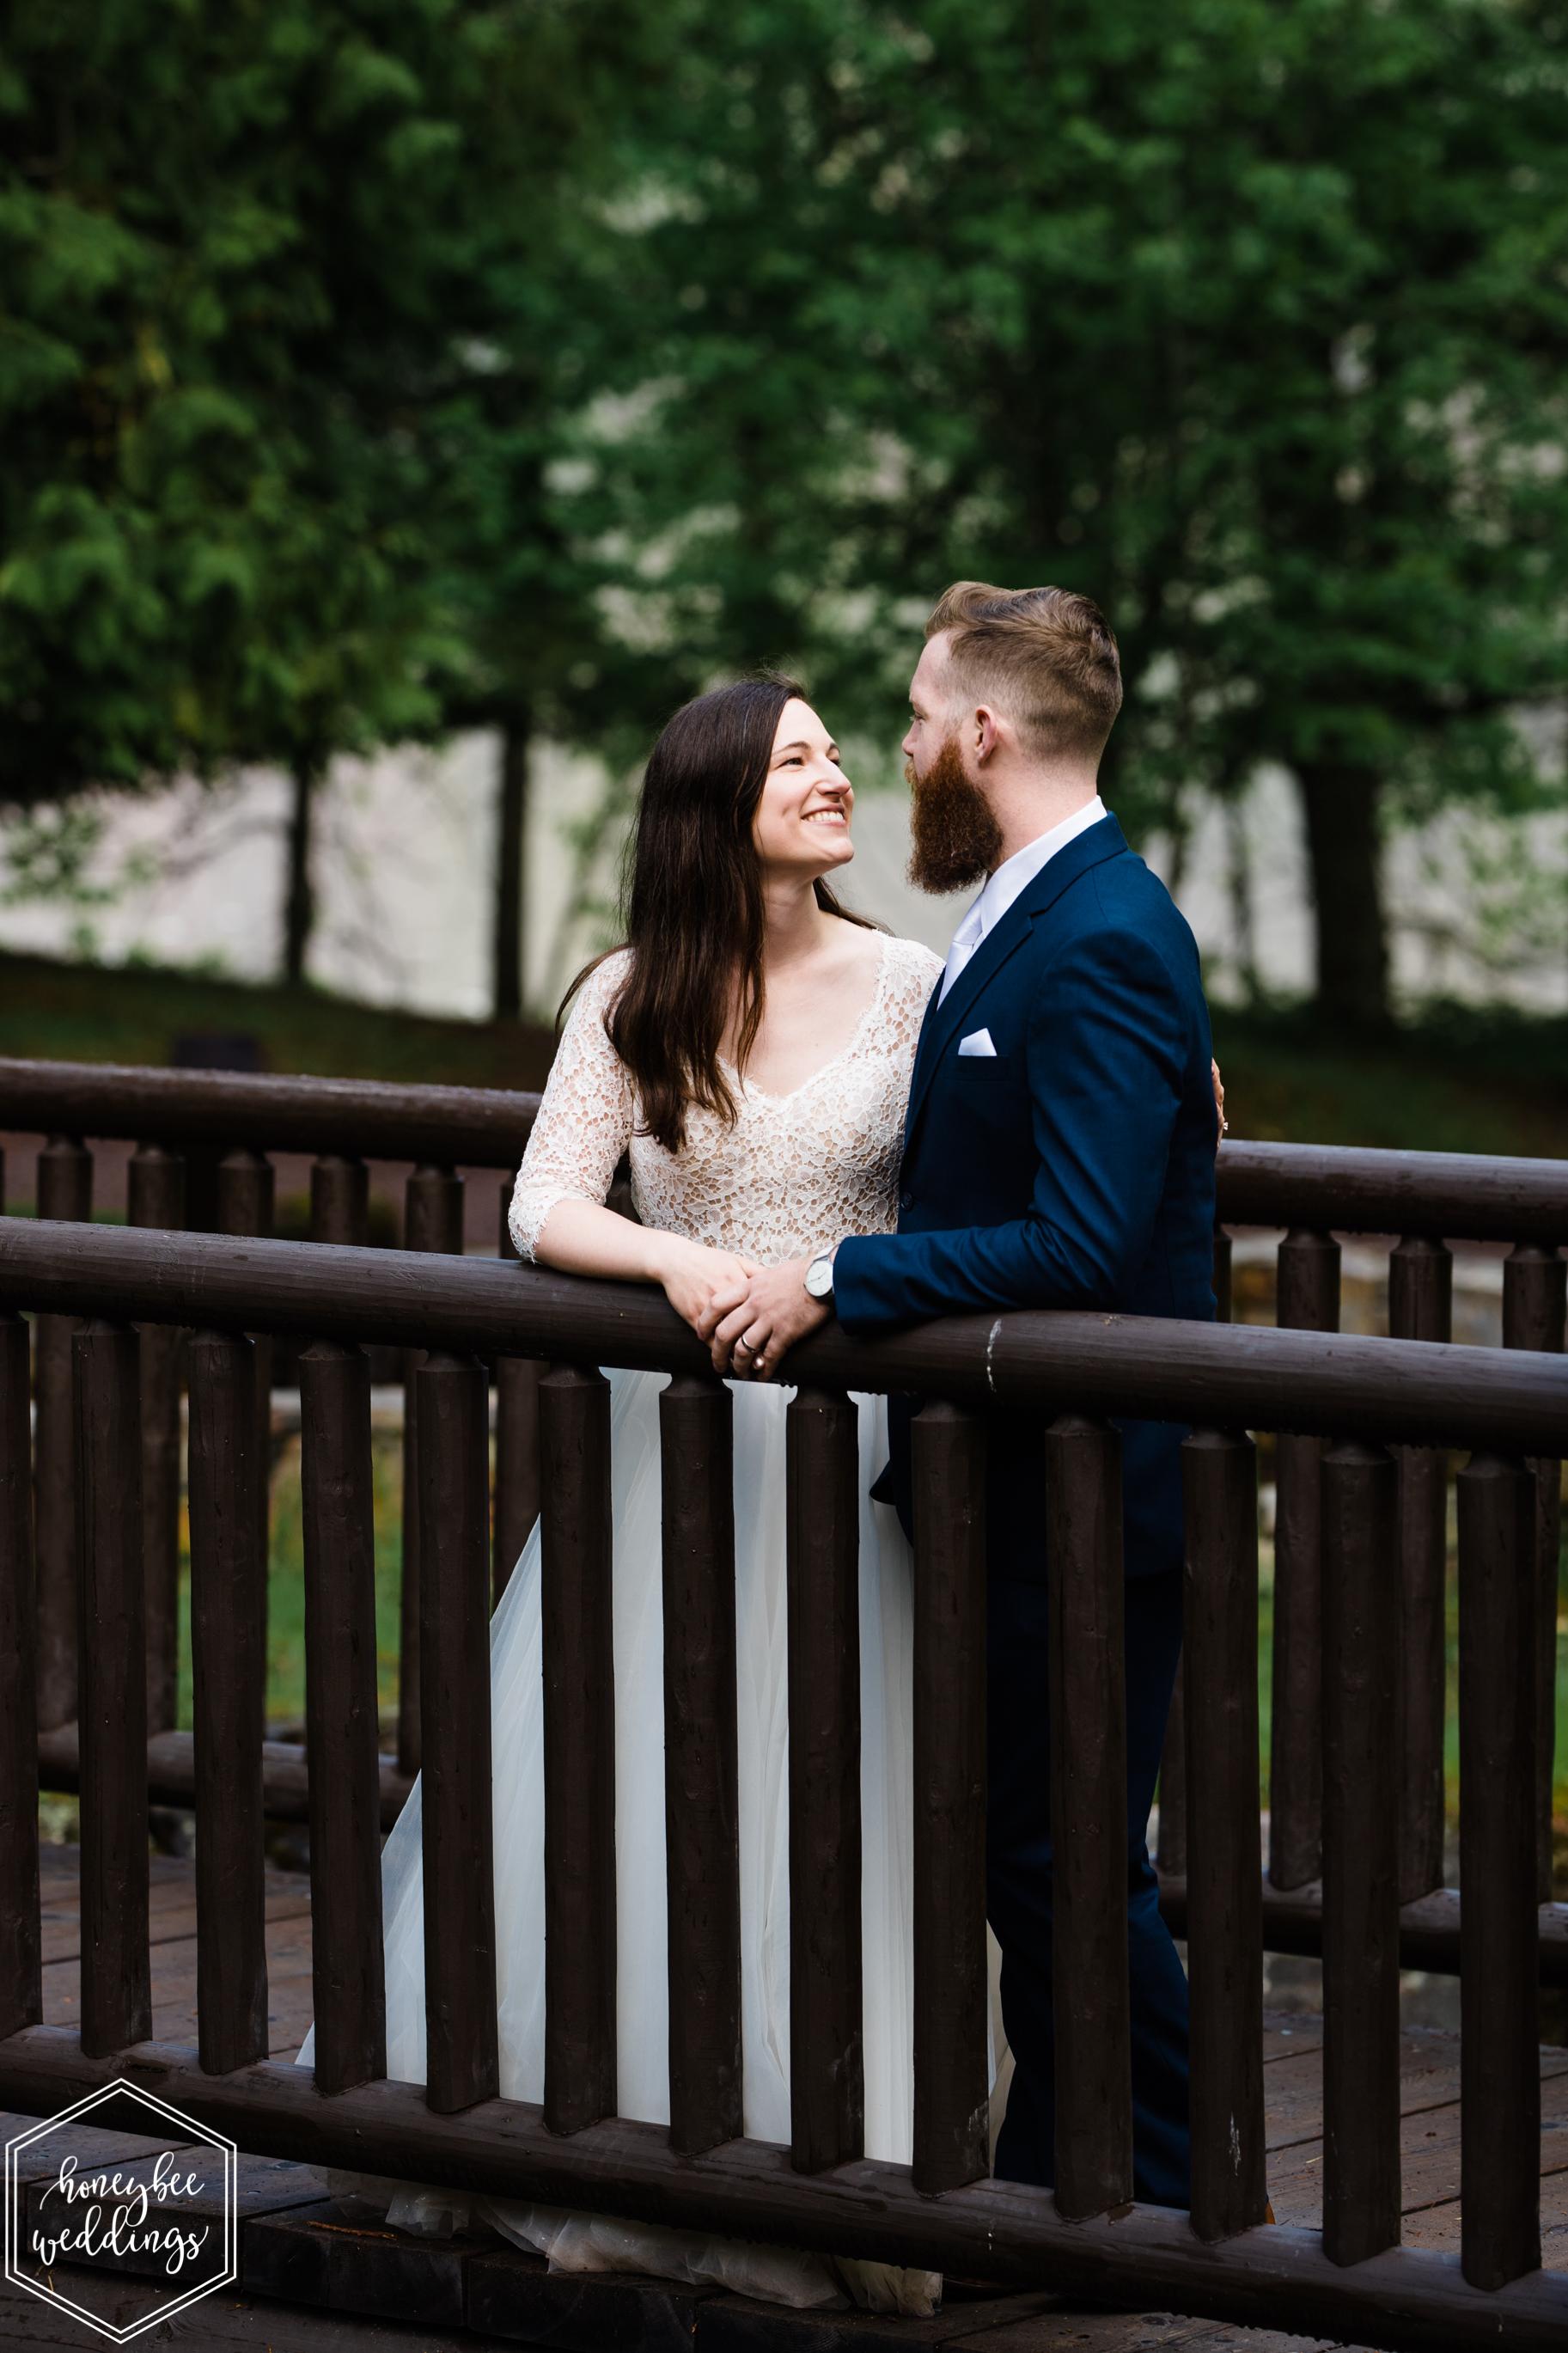 262Glacier National Park Wedding_Izaak Walton Inn Wedding_Honeybee Weddings_Norah & Kyle_June 09, 2019-65.jpg